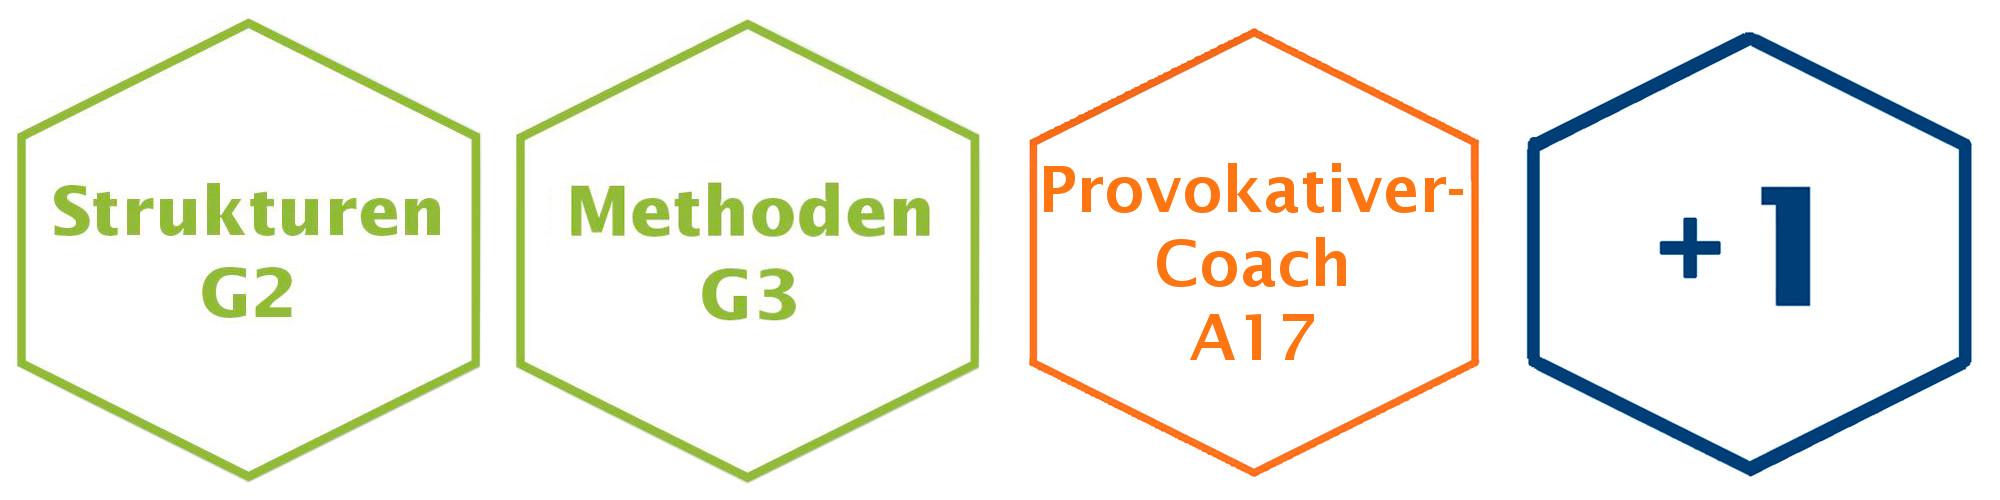 Provokativer Coach Ausbildung LNLPT Module